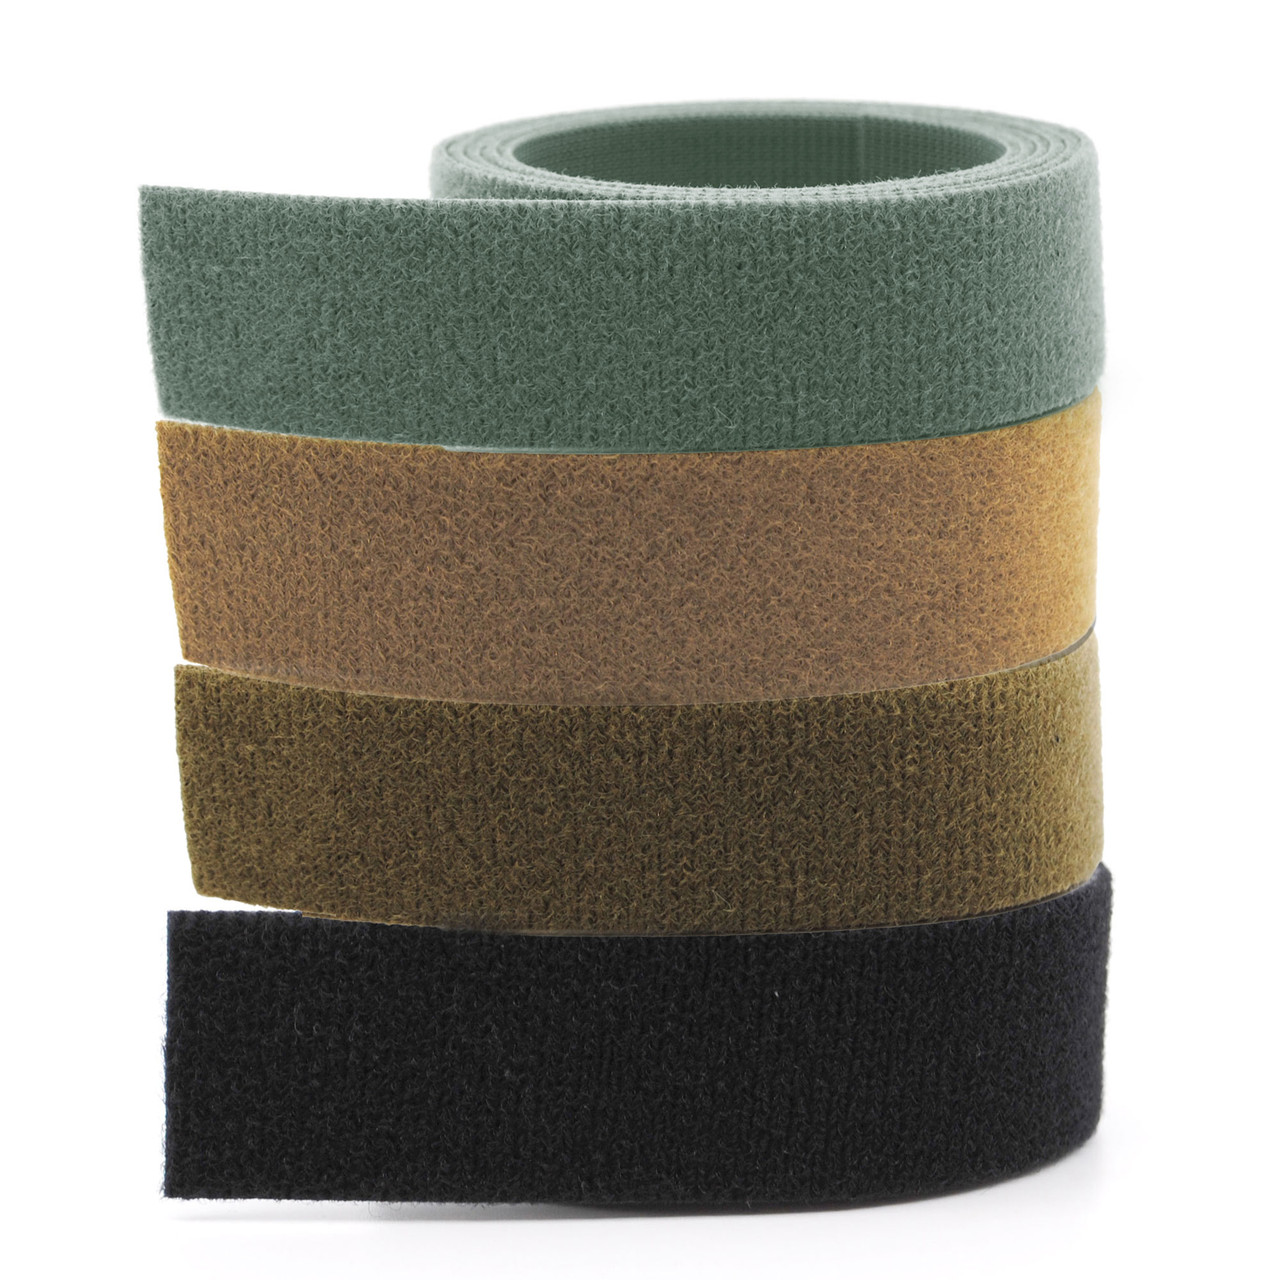 "VELCRO® ONE-WRAP® MIL SPEC Tape - 1"" Tan, Coyote Brown, Foliage Green, Black / Velcro Straps - Bundling Straps - Velcro Tie - Velcro Strap"